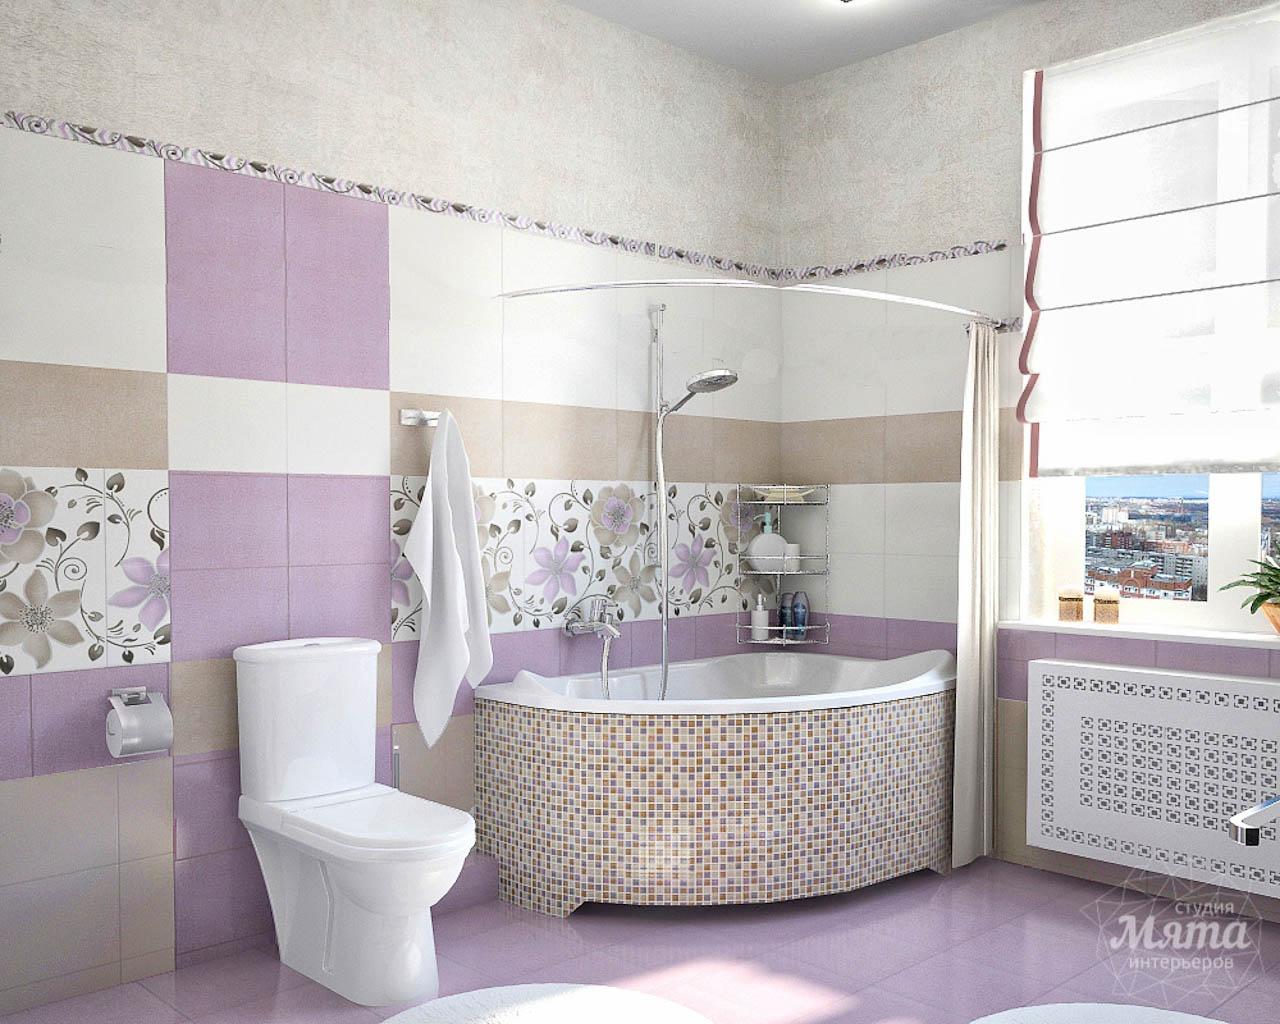 Дизайн интерьера и ремонт трехкомнатной квартиры по ул. Чкалова 124 img967064743